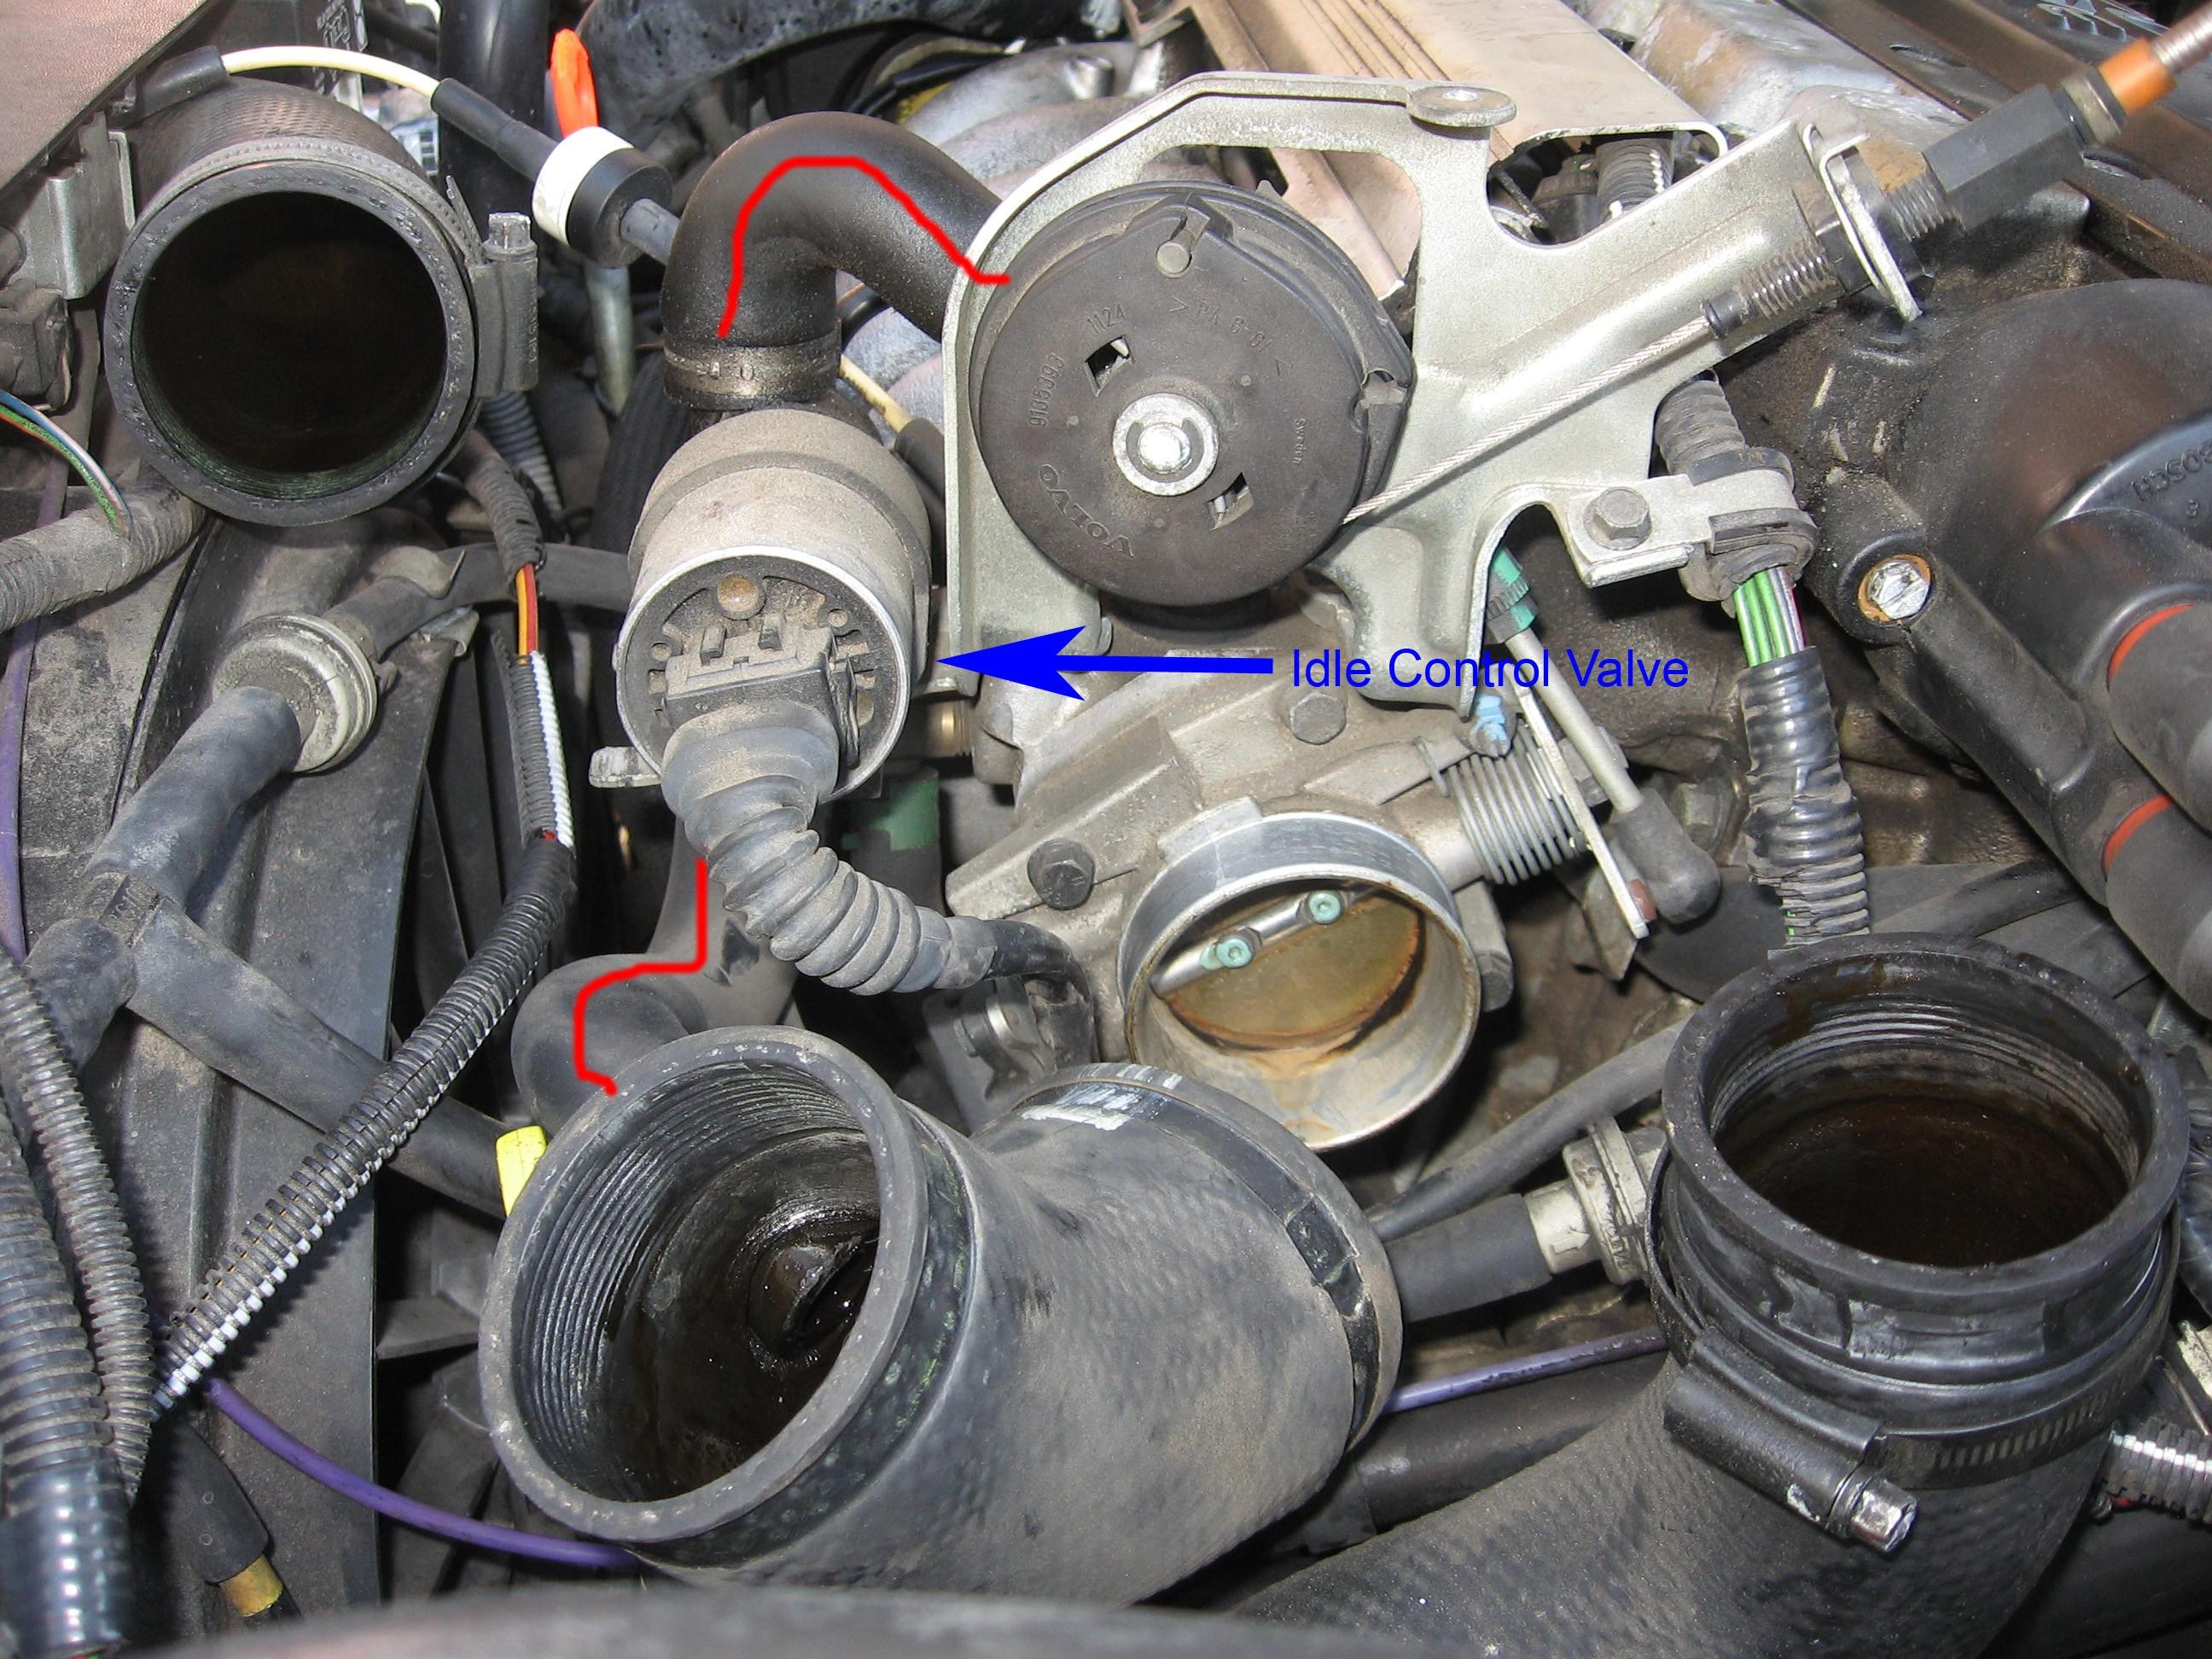 Volvo V50 Engine Diagram Problems With Se 20d Diesel 5 Cylinder Related Post